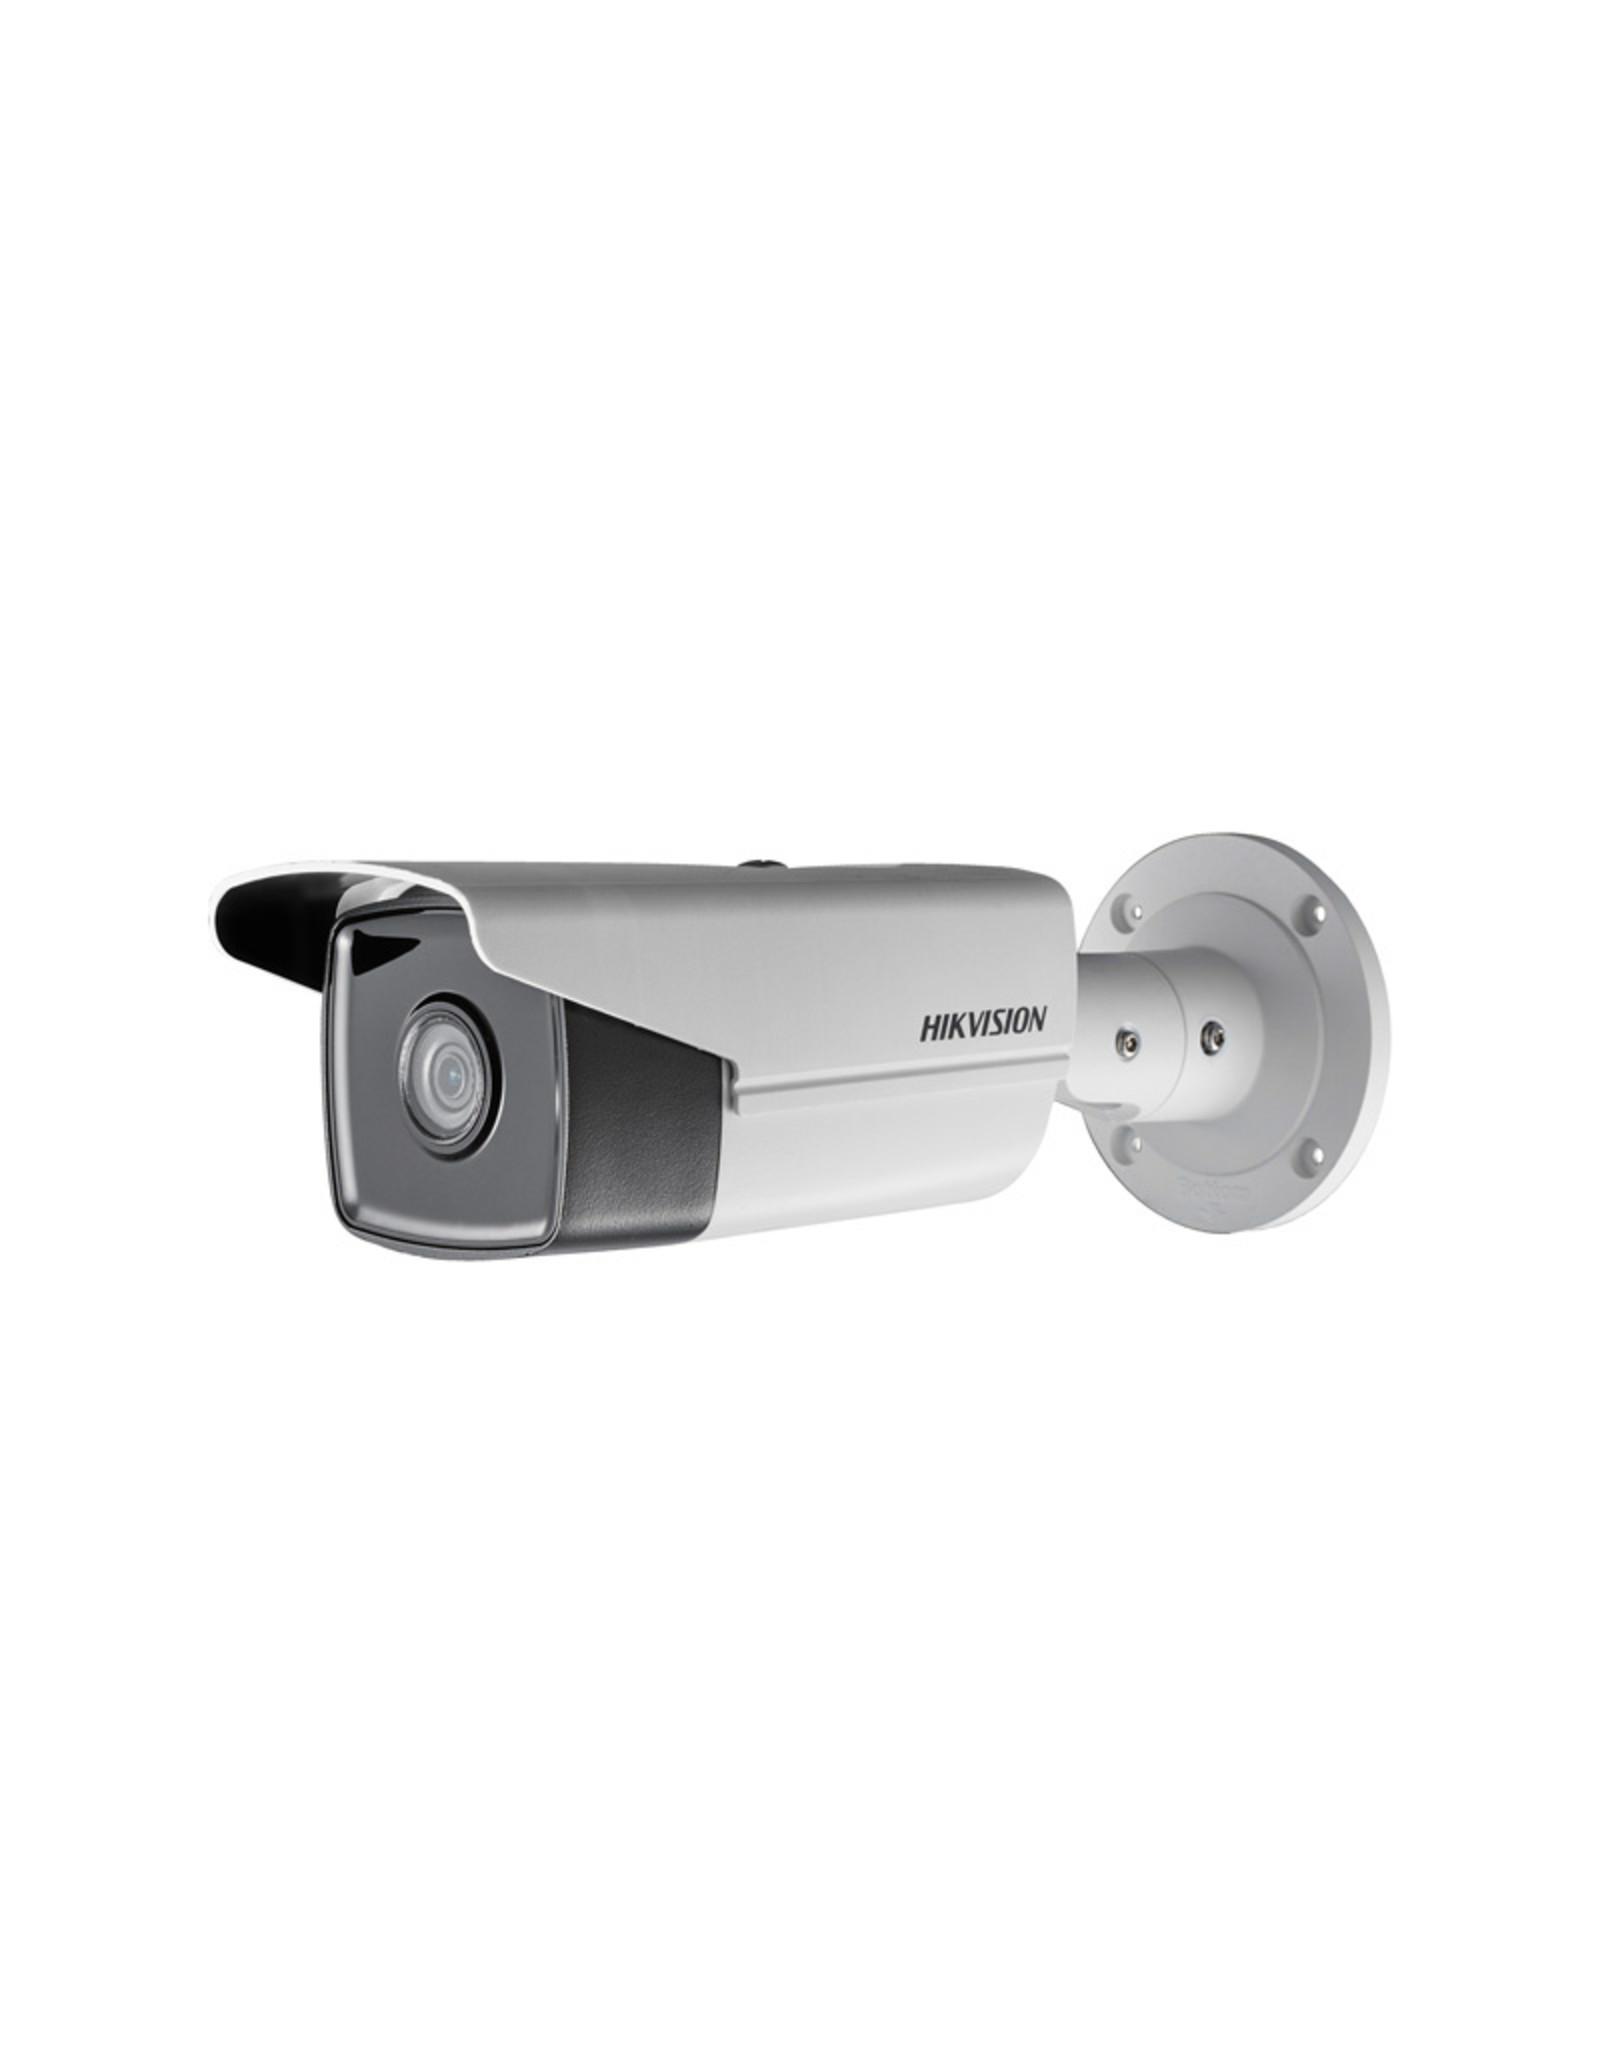 Hikvision Hikvision DS-2CD2T85FWD-I5